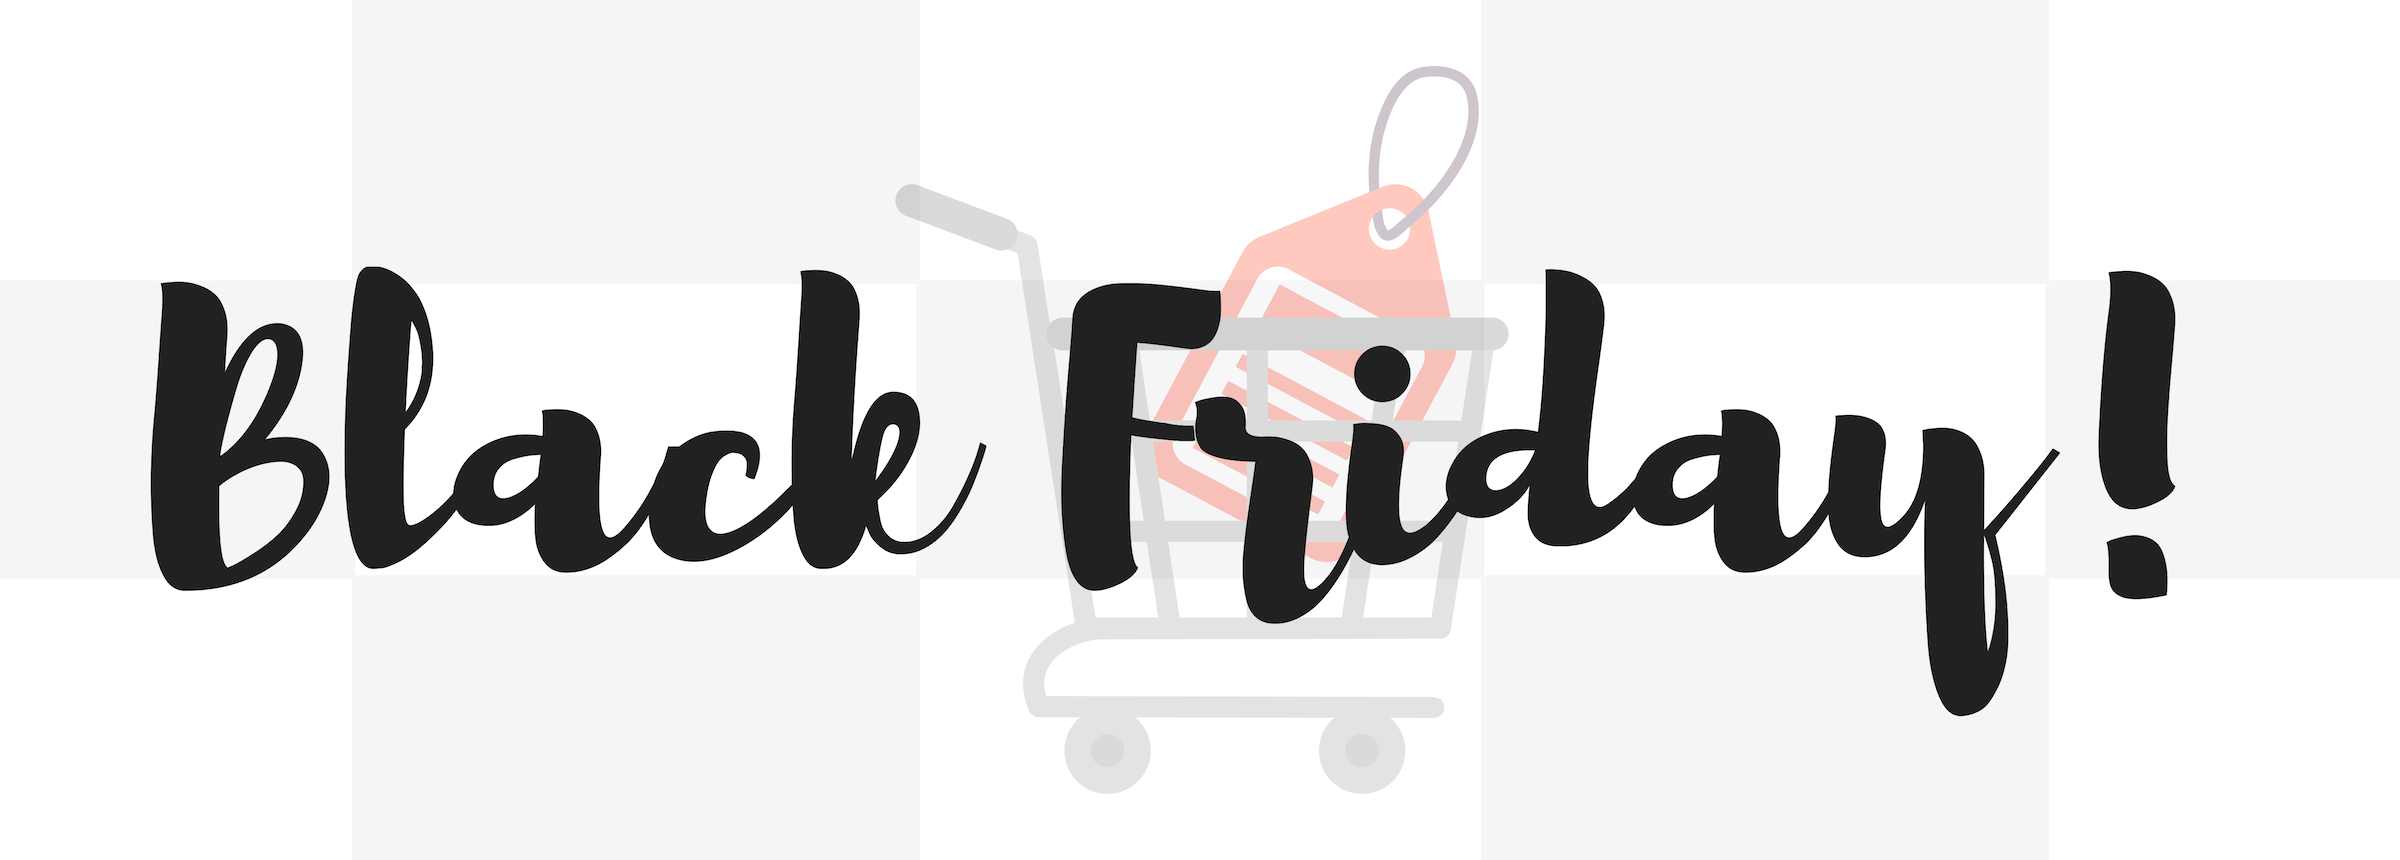 Black Friday 2018 Slider